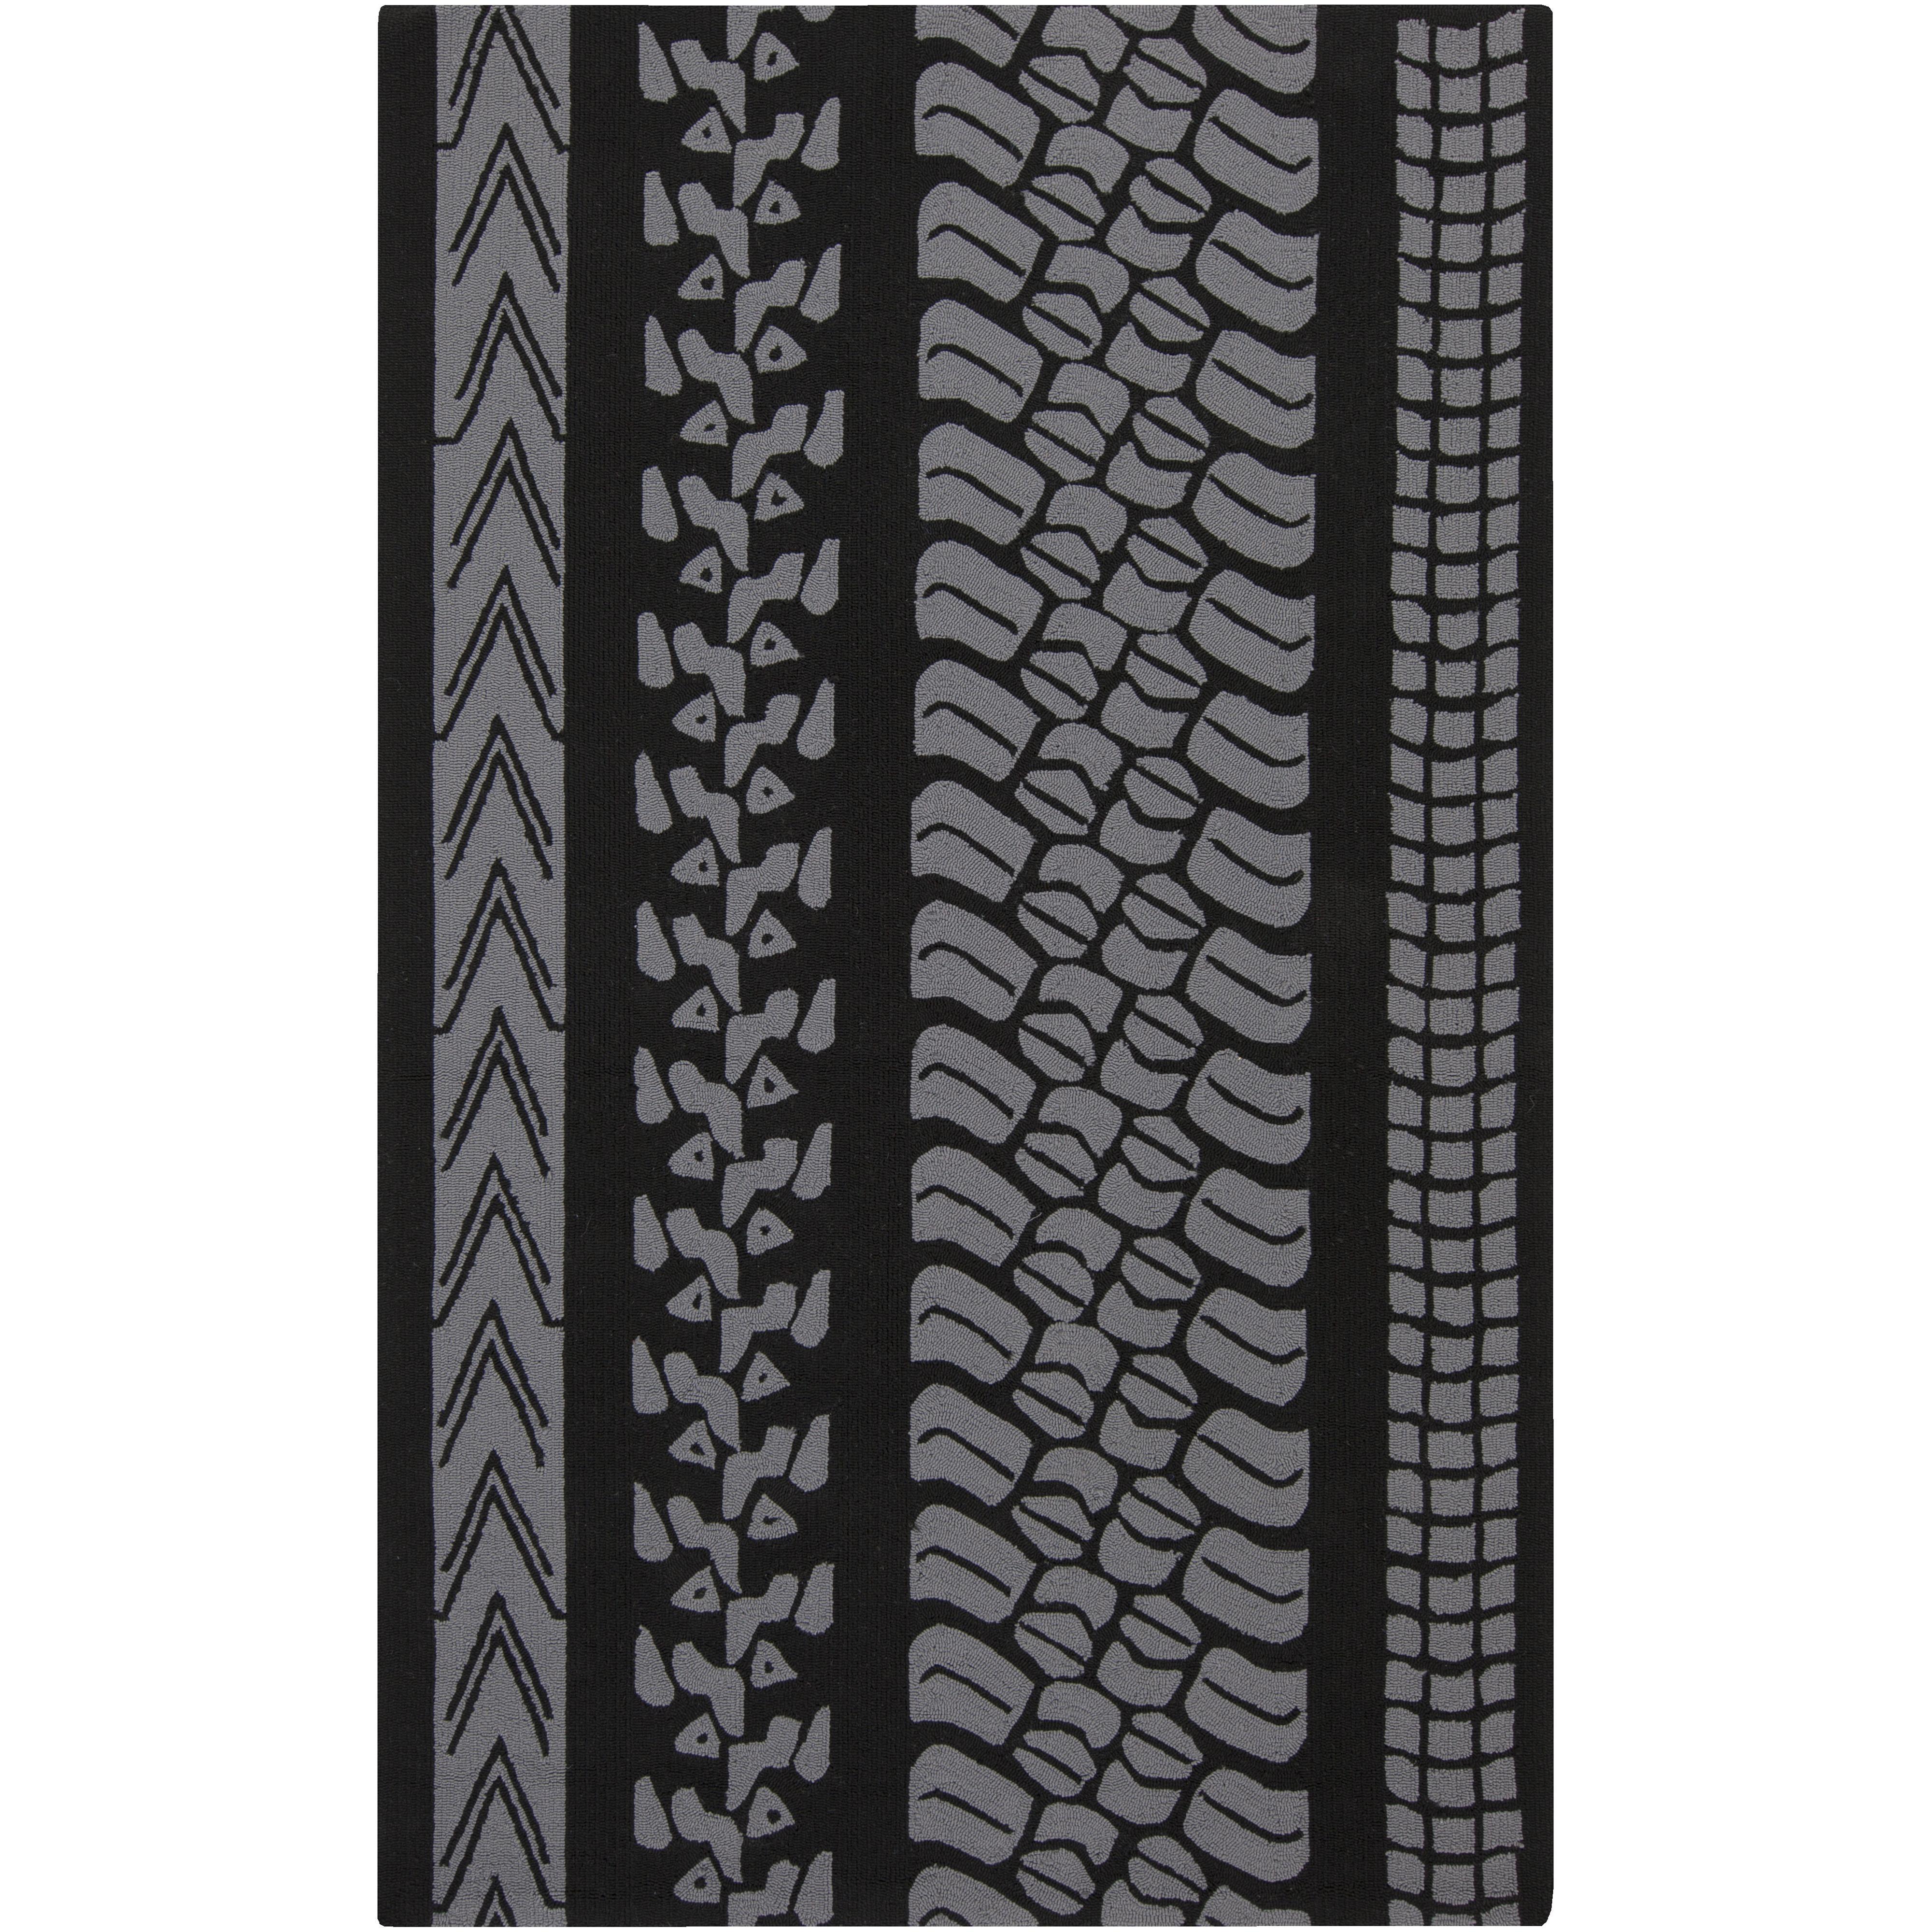 Surya Rugs Pandemonium 2' x 3' - Item Number: PDM1006-23